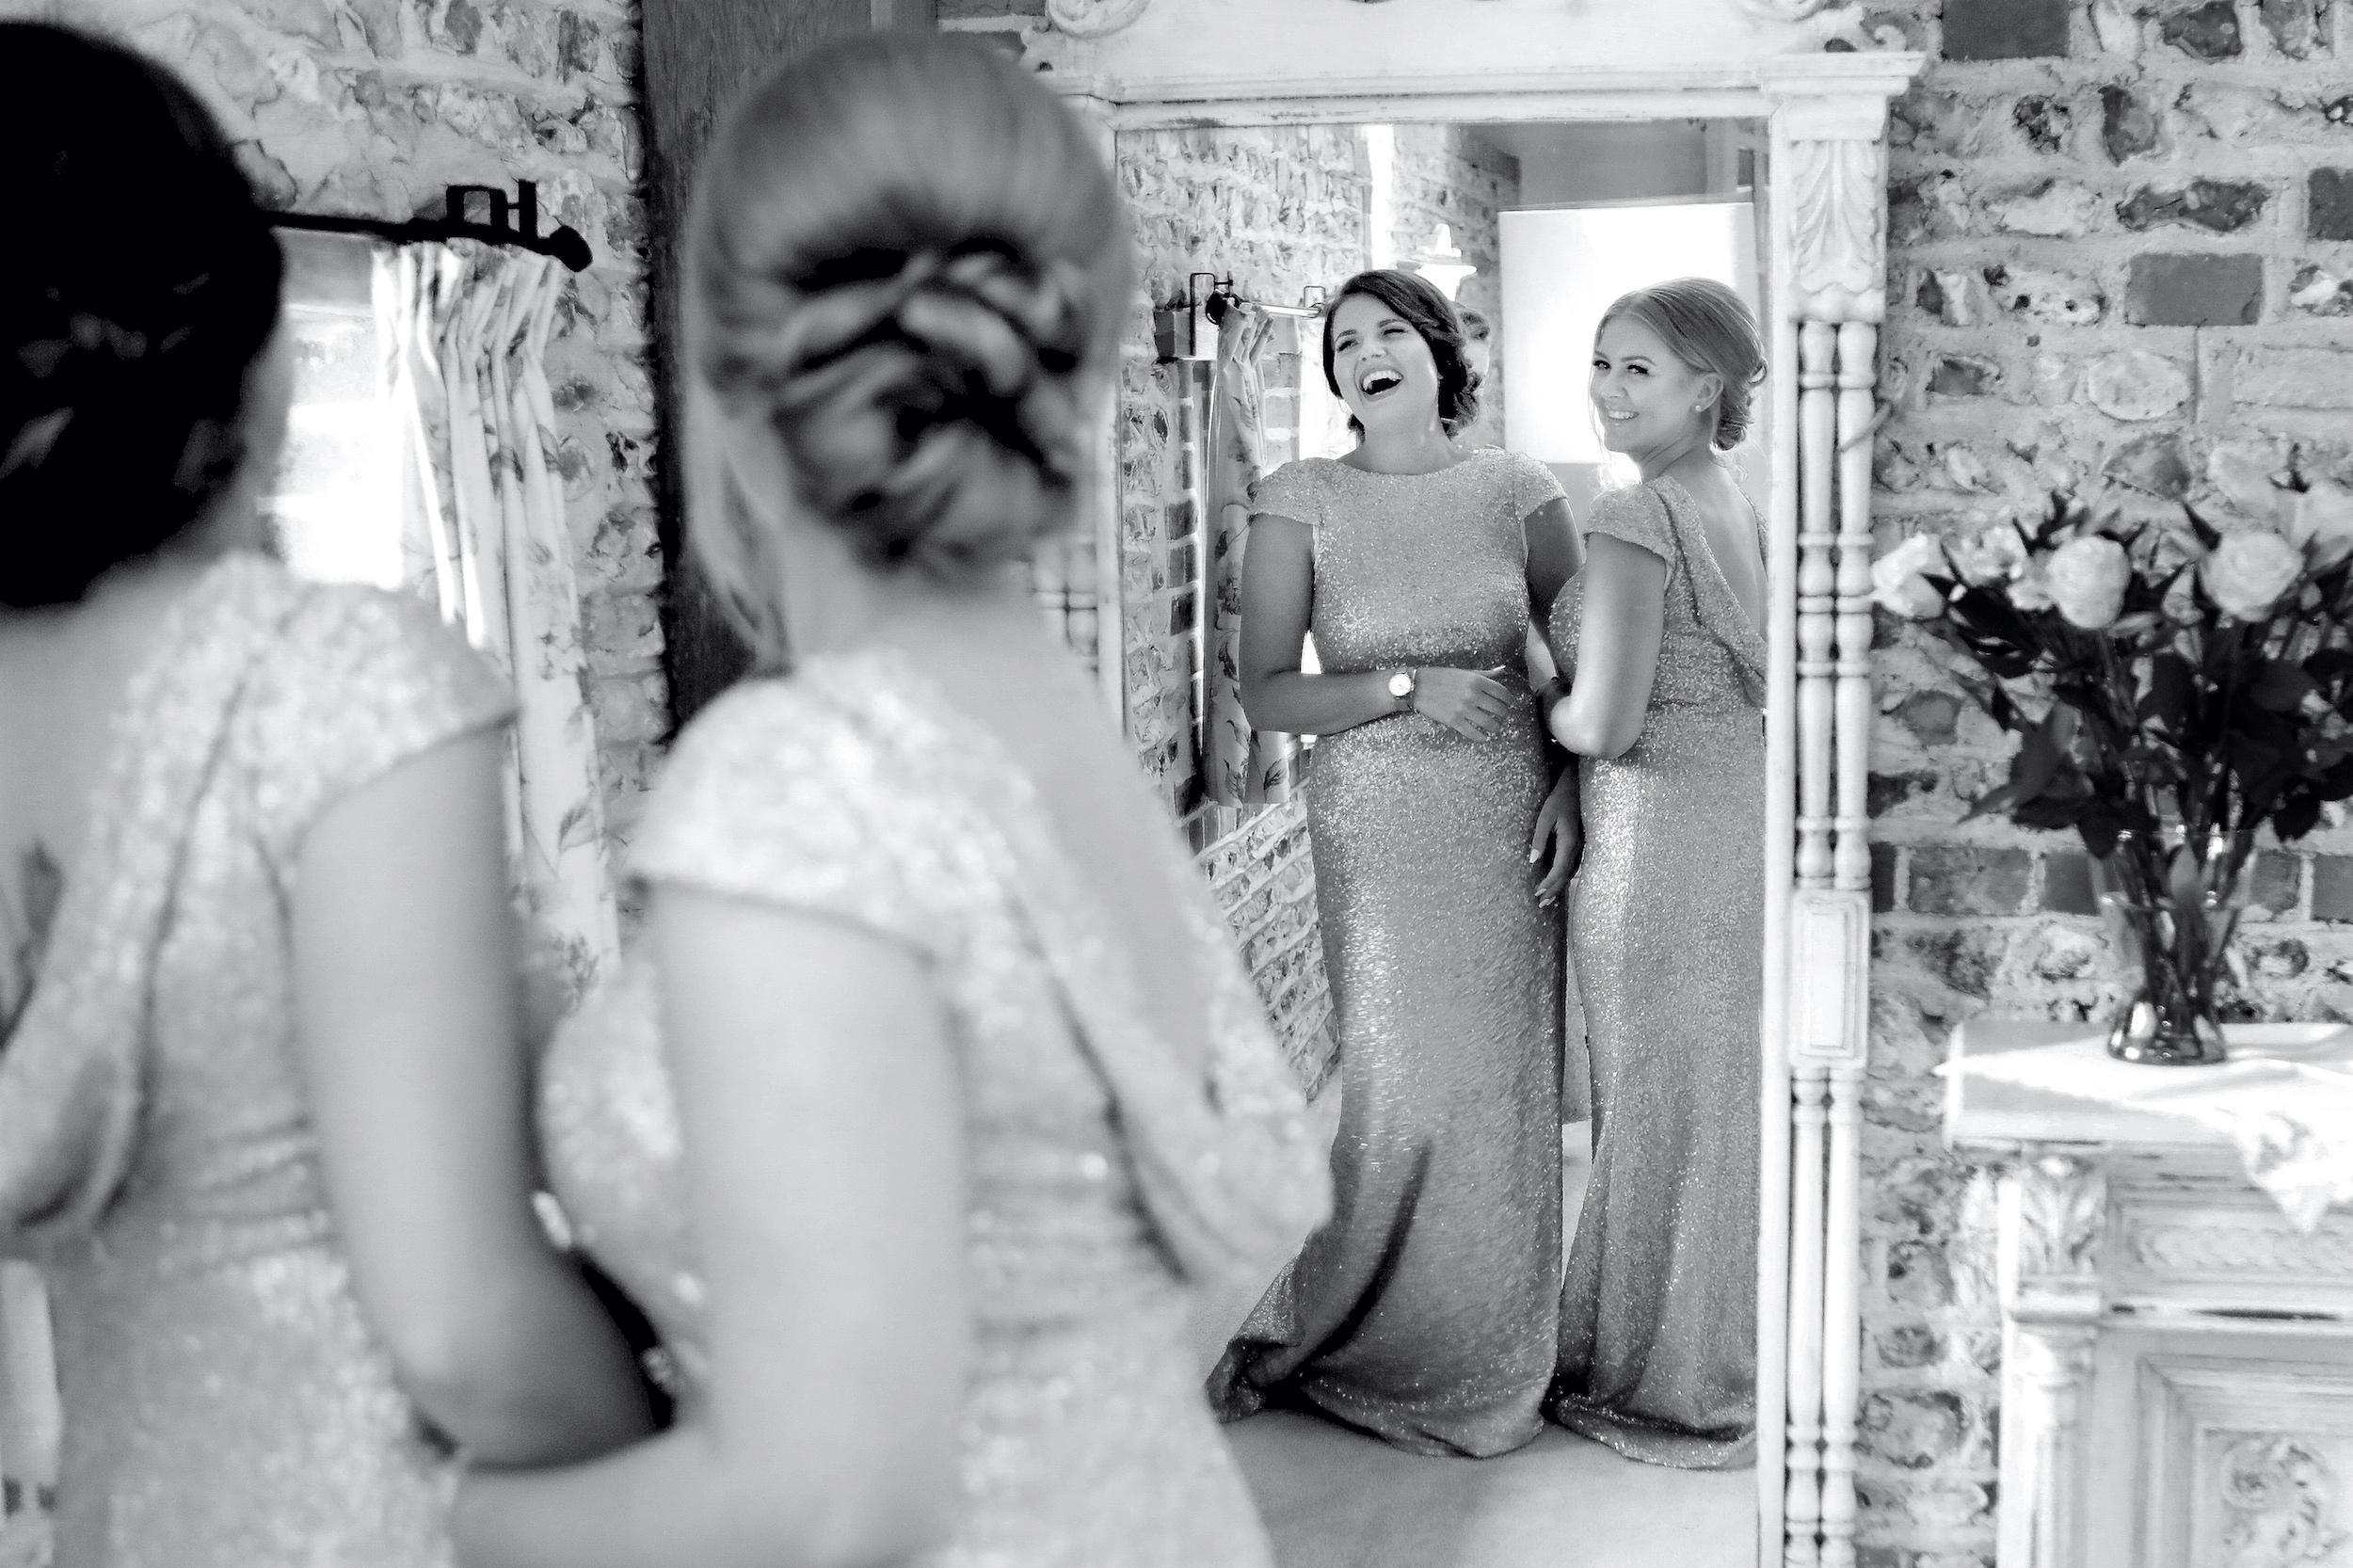 candid wedding photography bridesmaids upwaltham barns